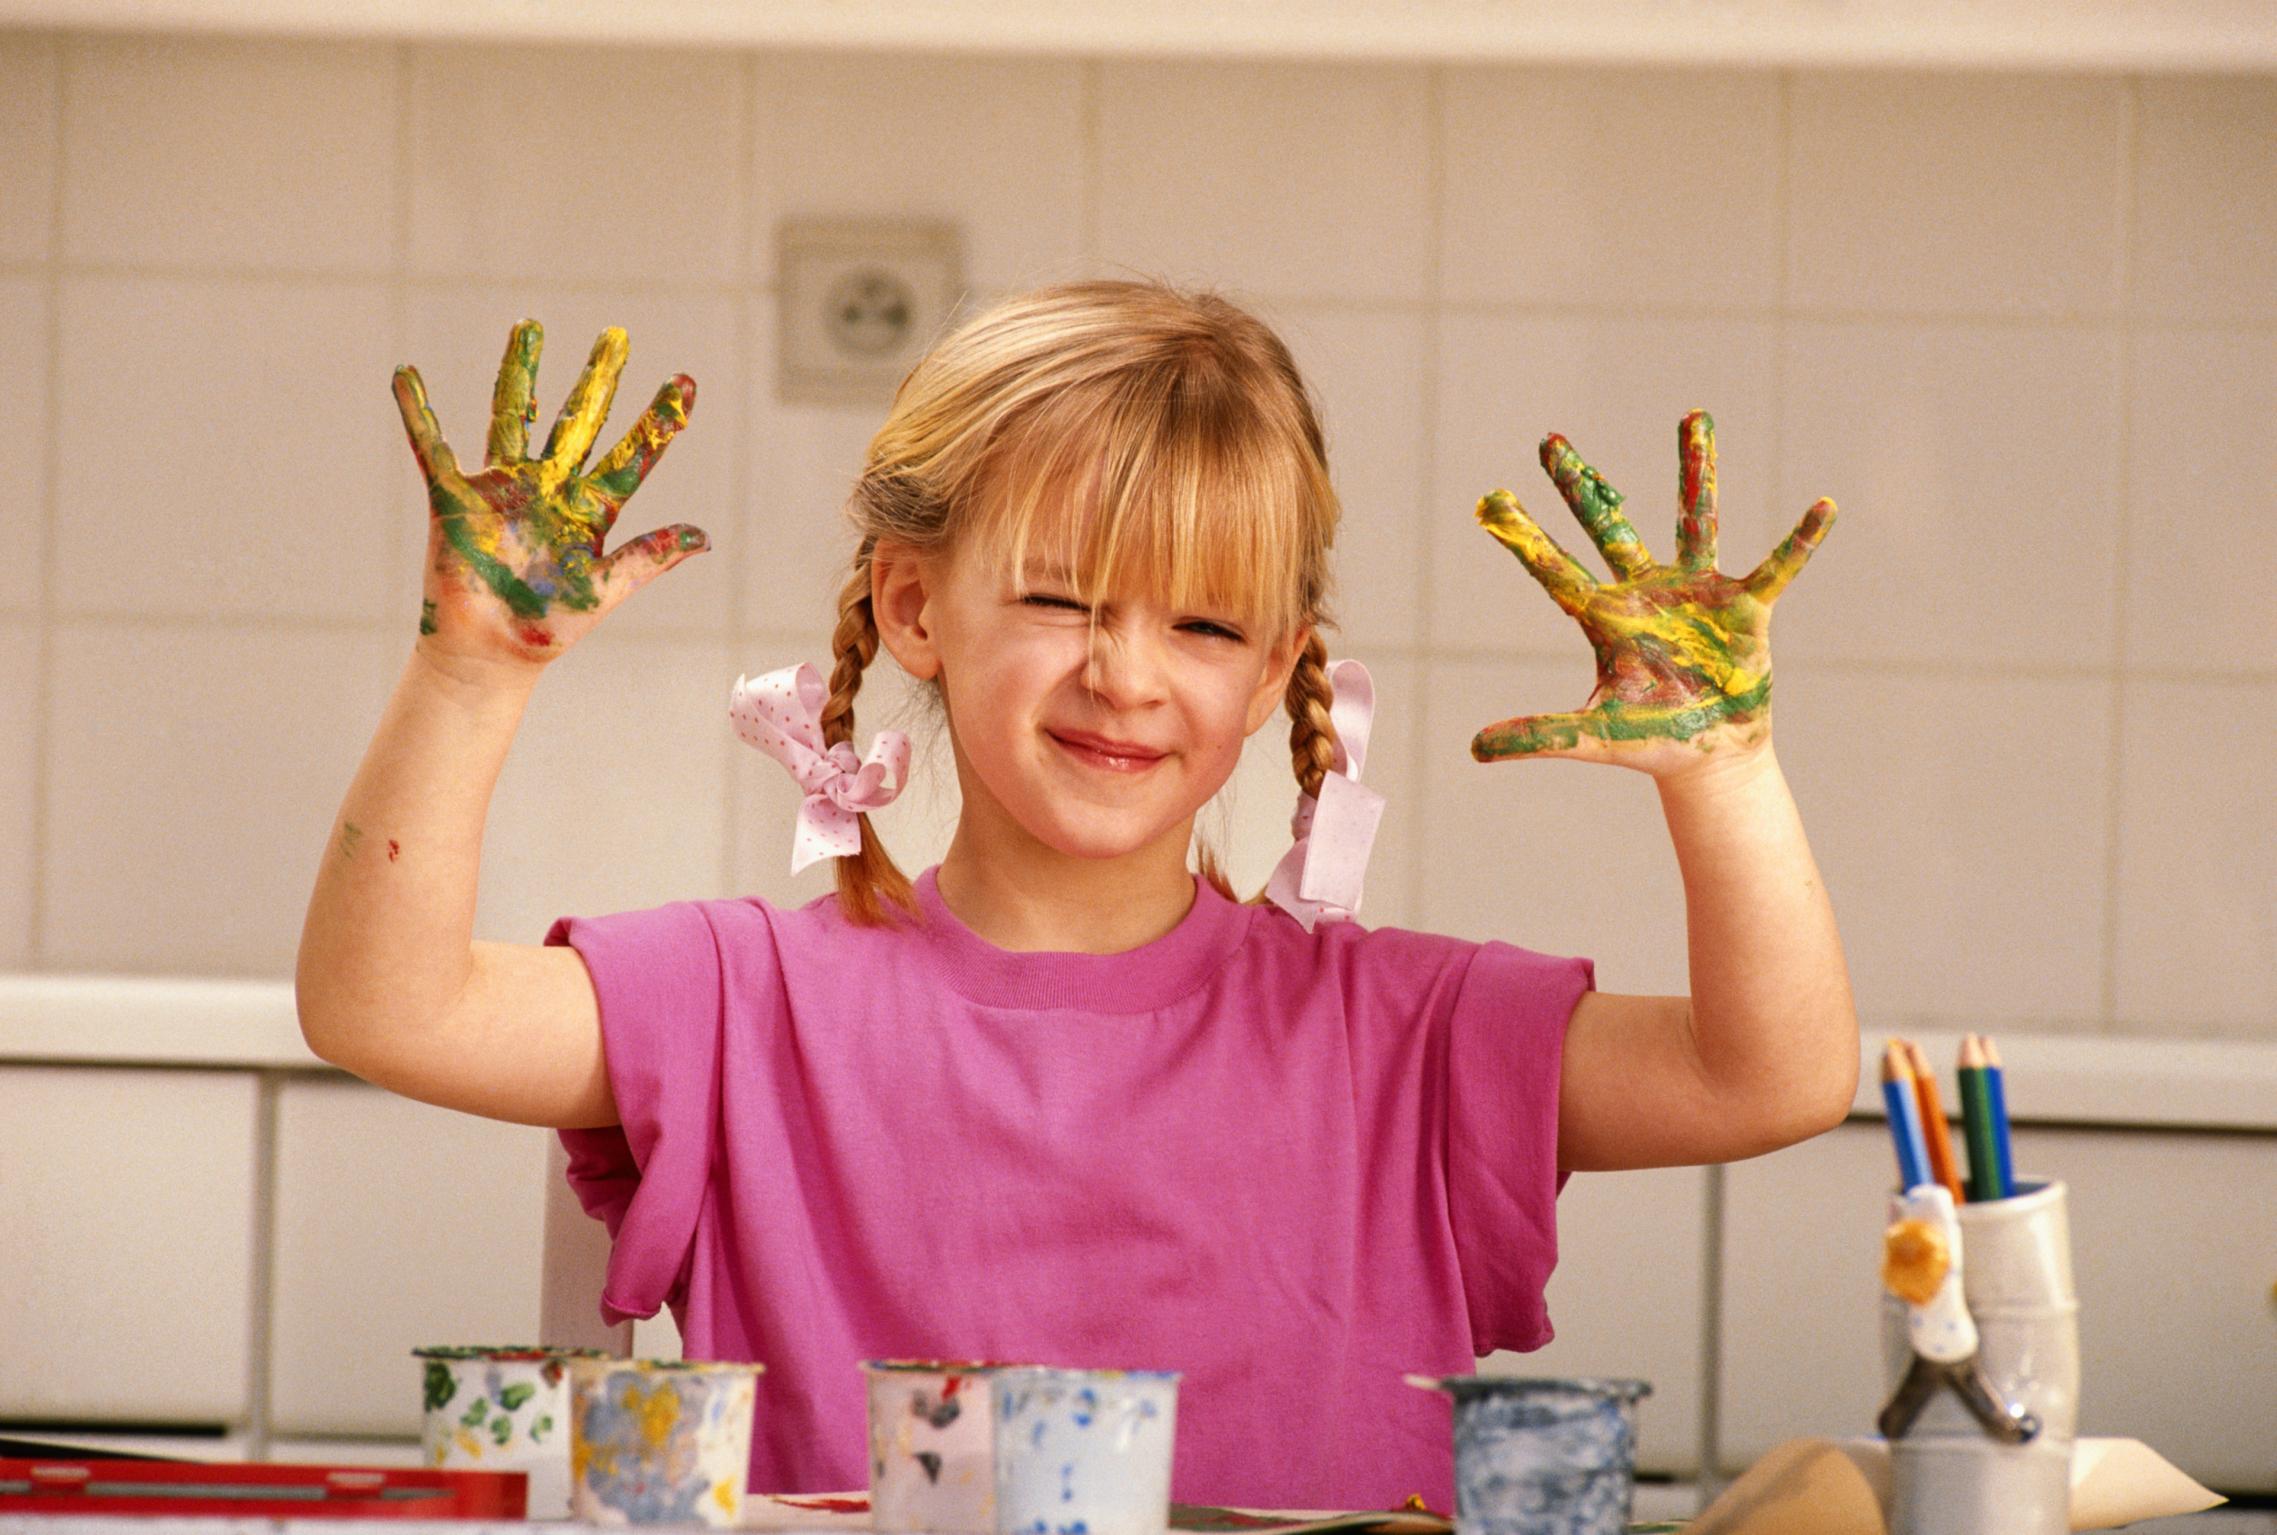 actividades de mezclar pinturas de colores para preescolar ehow en espaol